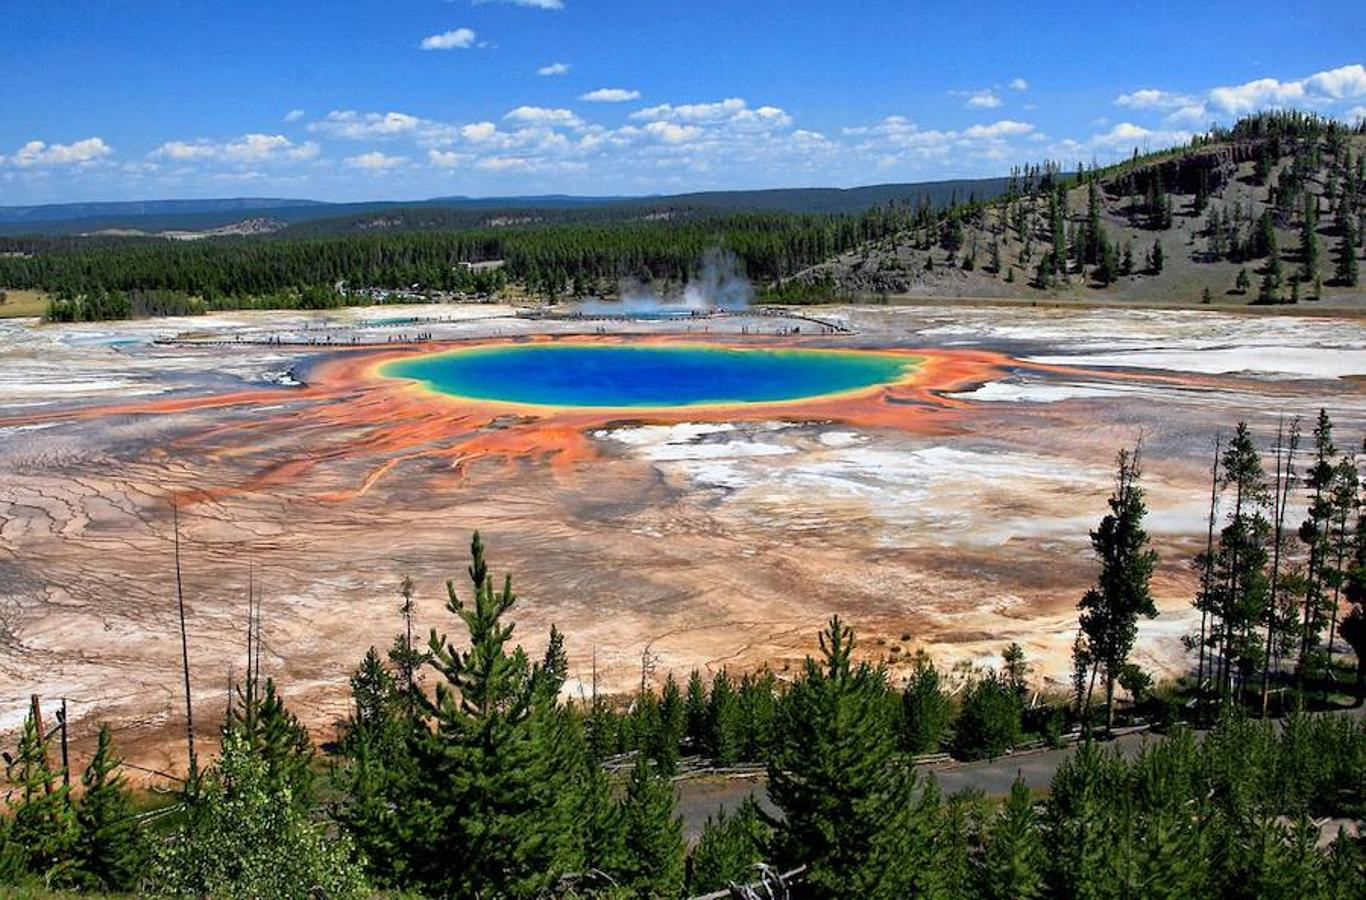 Los mejores parques naturales del mundo